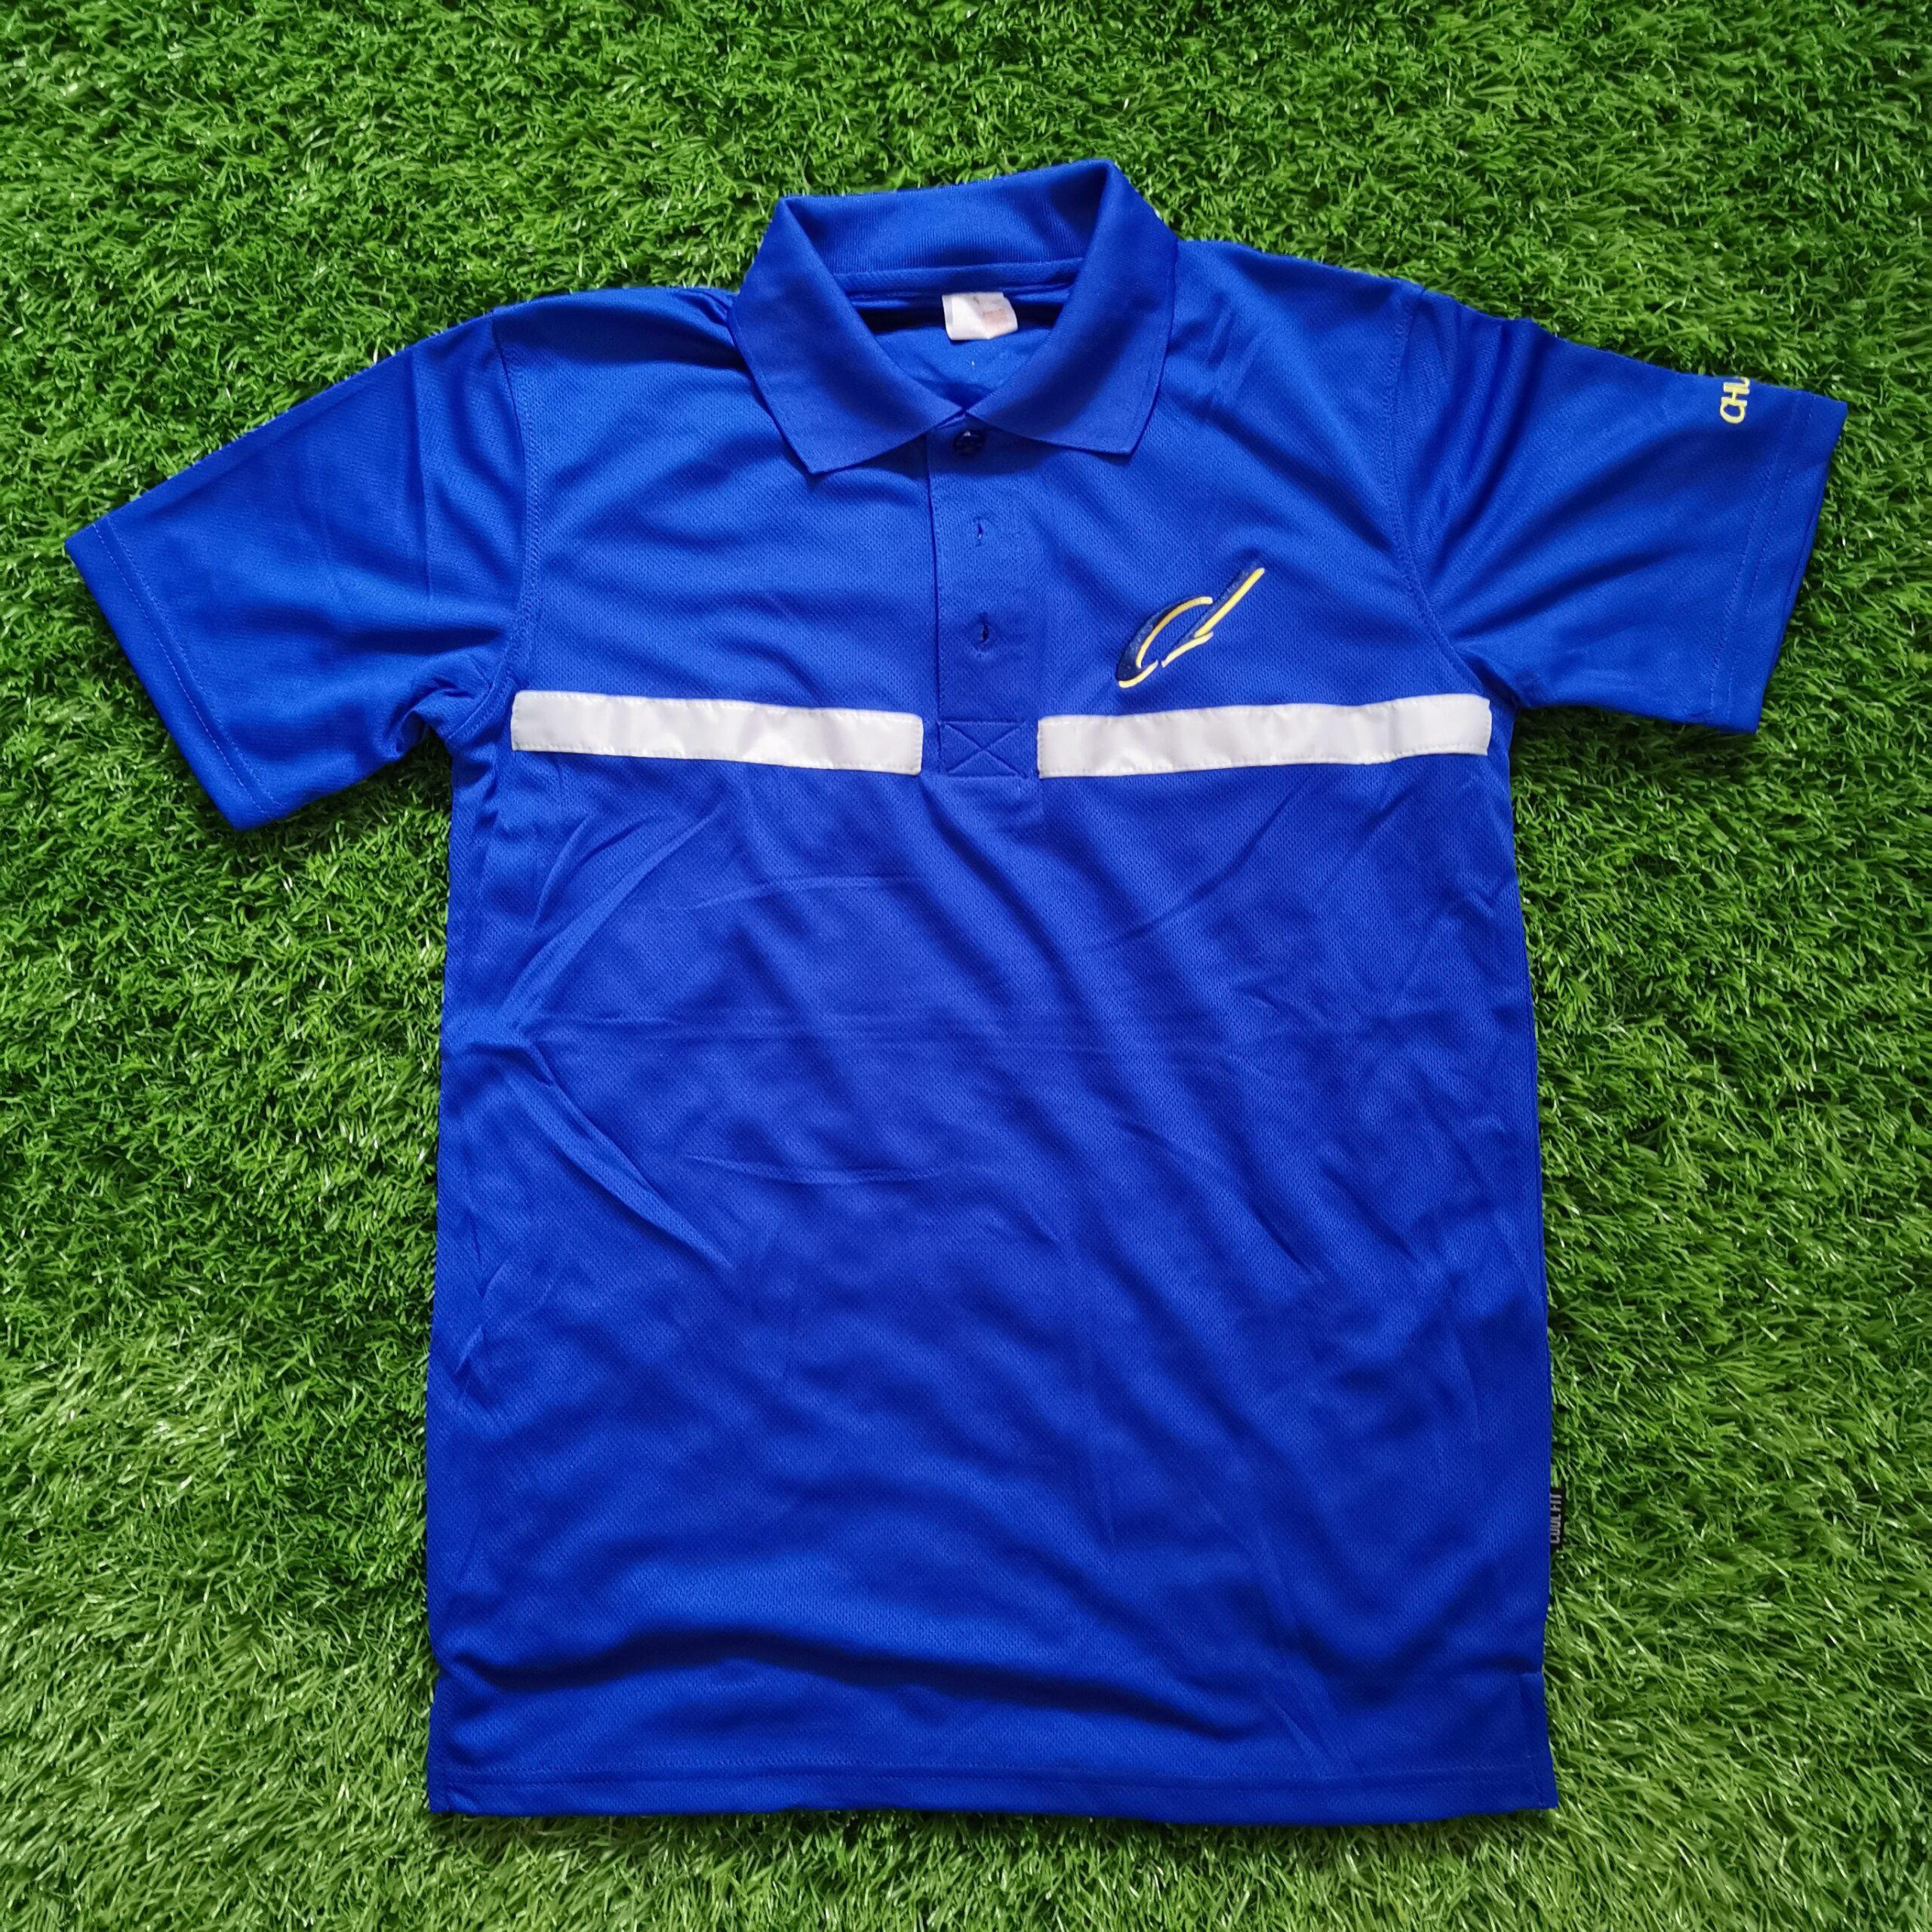 Custom Reflective Strips On Polo T-Shirt